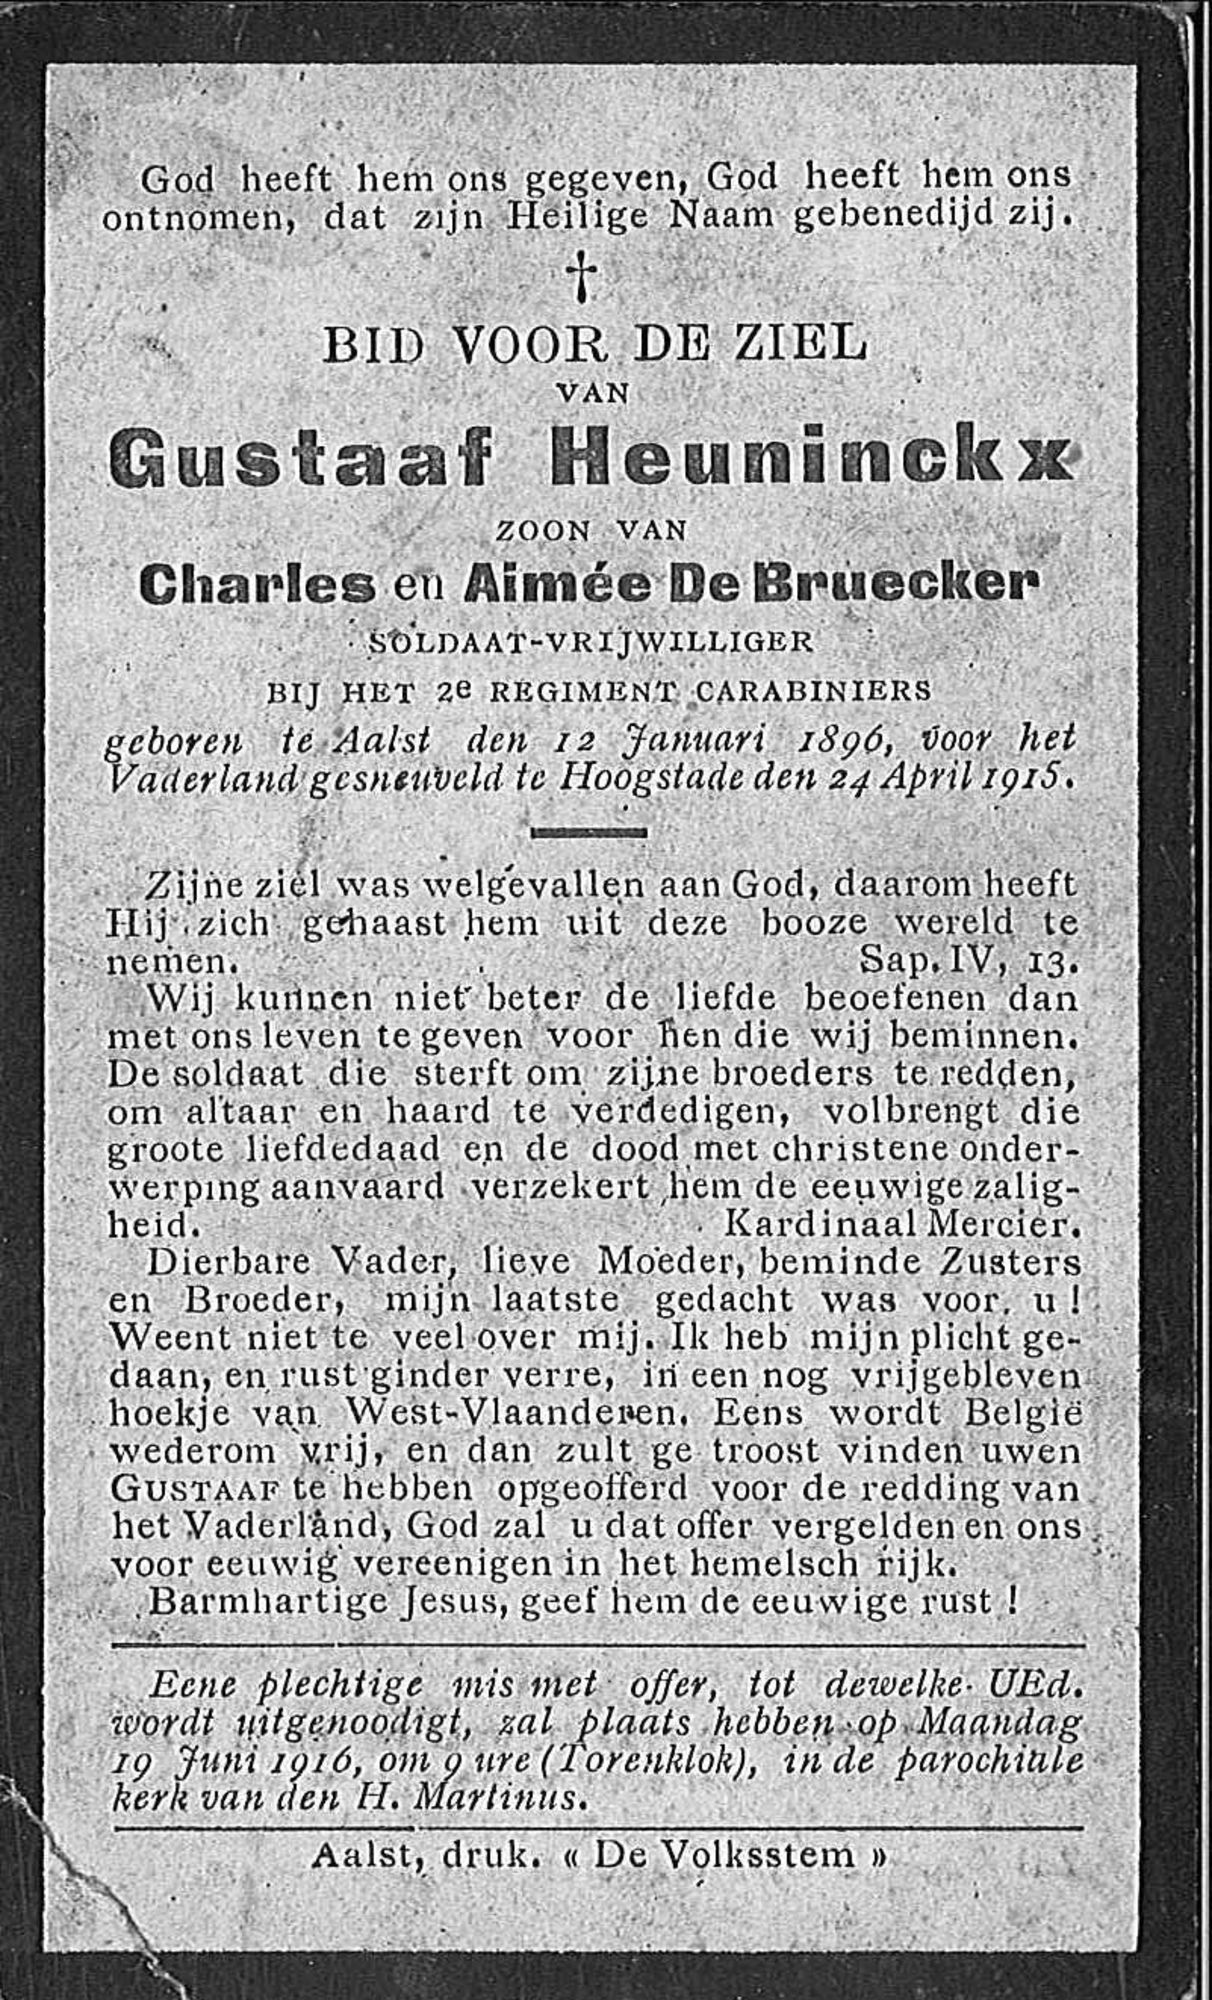 Gustaaf Heuninckx